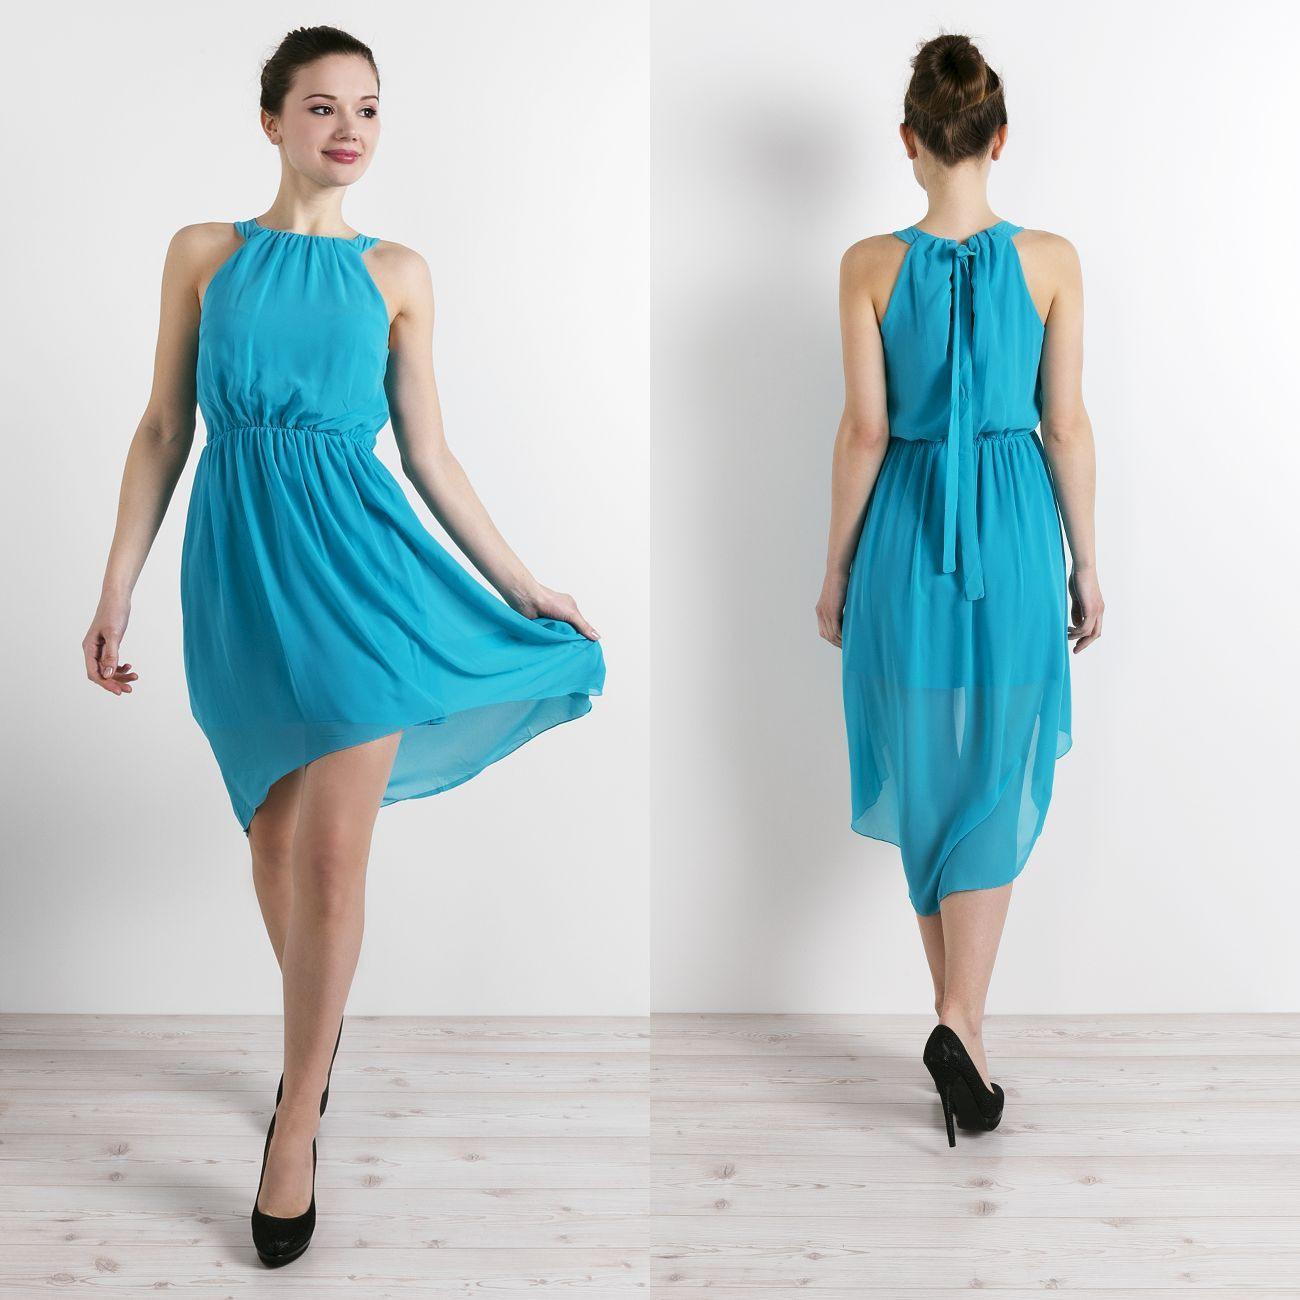 20 Elegant Abendkleid Vero Moda Galerie10 Wunderbar Abendkleid Vero Moda Galerie